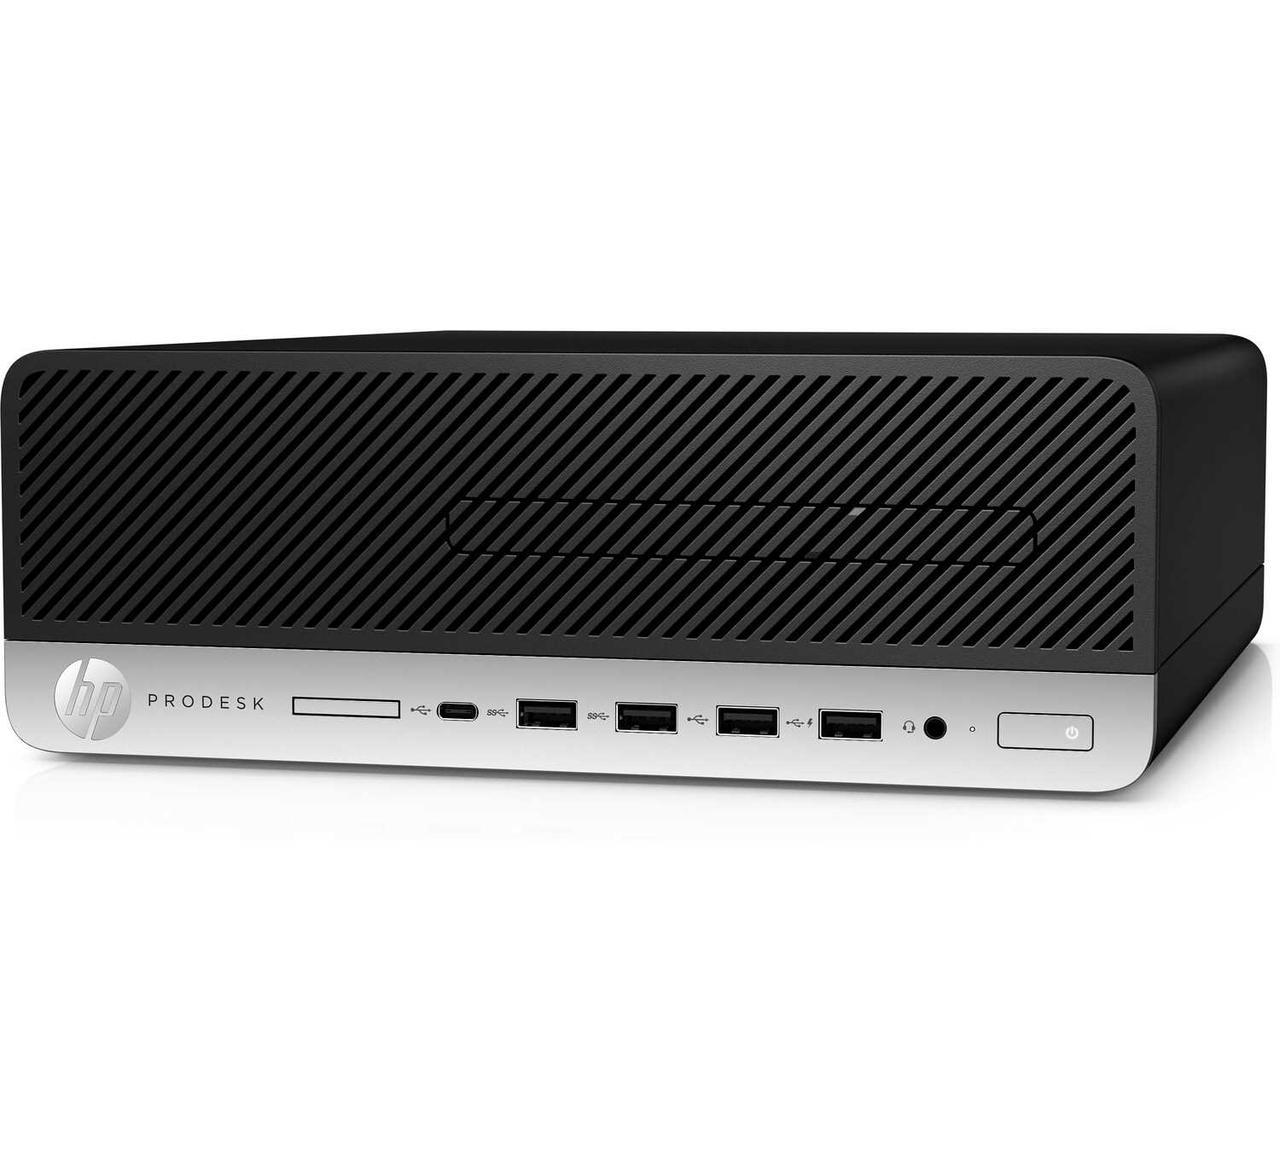 КомпьютерHP Prodesk 600G3SFF / Platinum / i7-7700 / 16GB / 512GB SSD / DOS / No ODD / 3yw / USB Slim kbd / mo